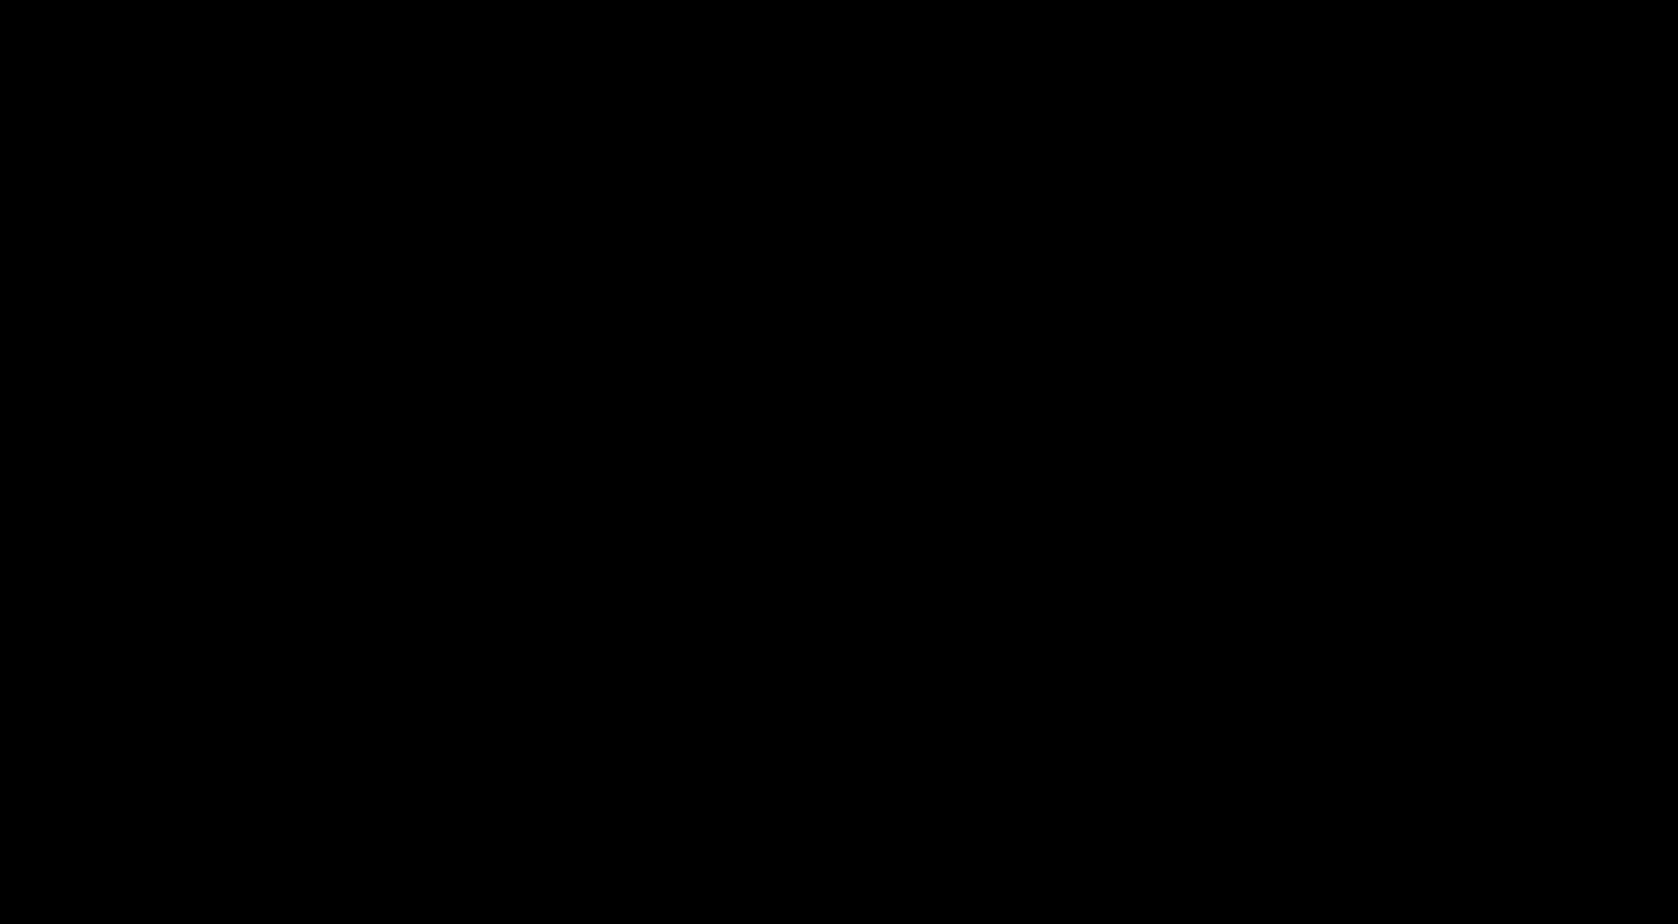 N-Dansyl-6-aminohexanol